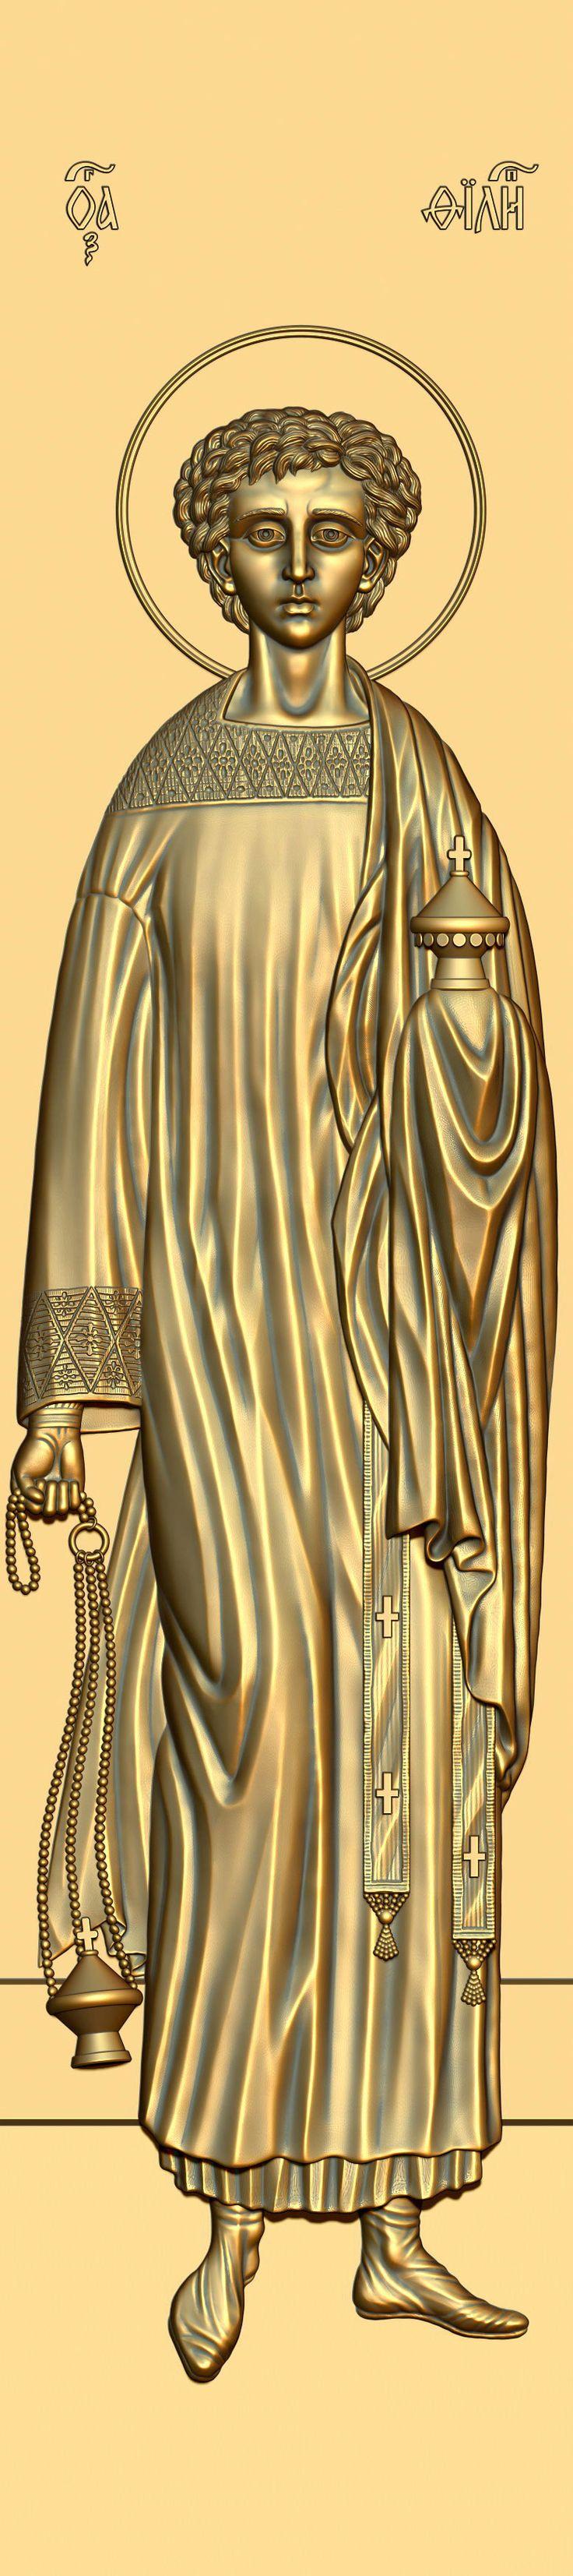 St. Philip the deacon of Caesarea. 3D model for CNC milling machine. Simulation programs: MoI, ArtCam, ZBrush. Private order.